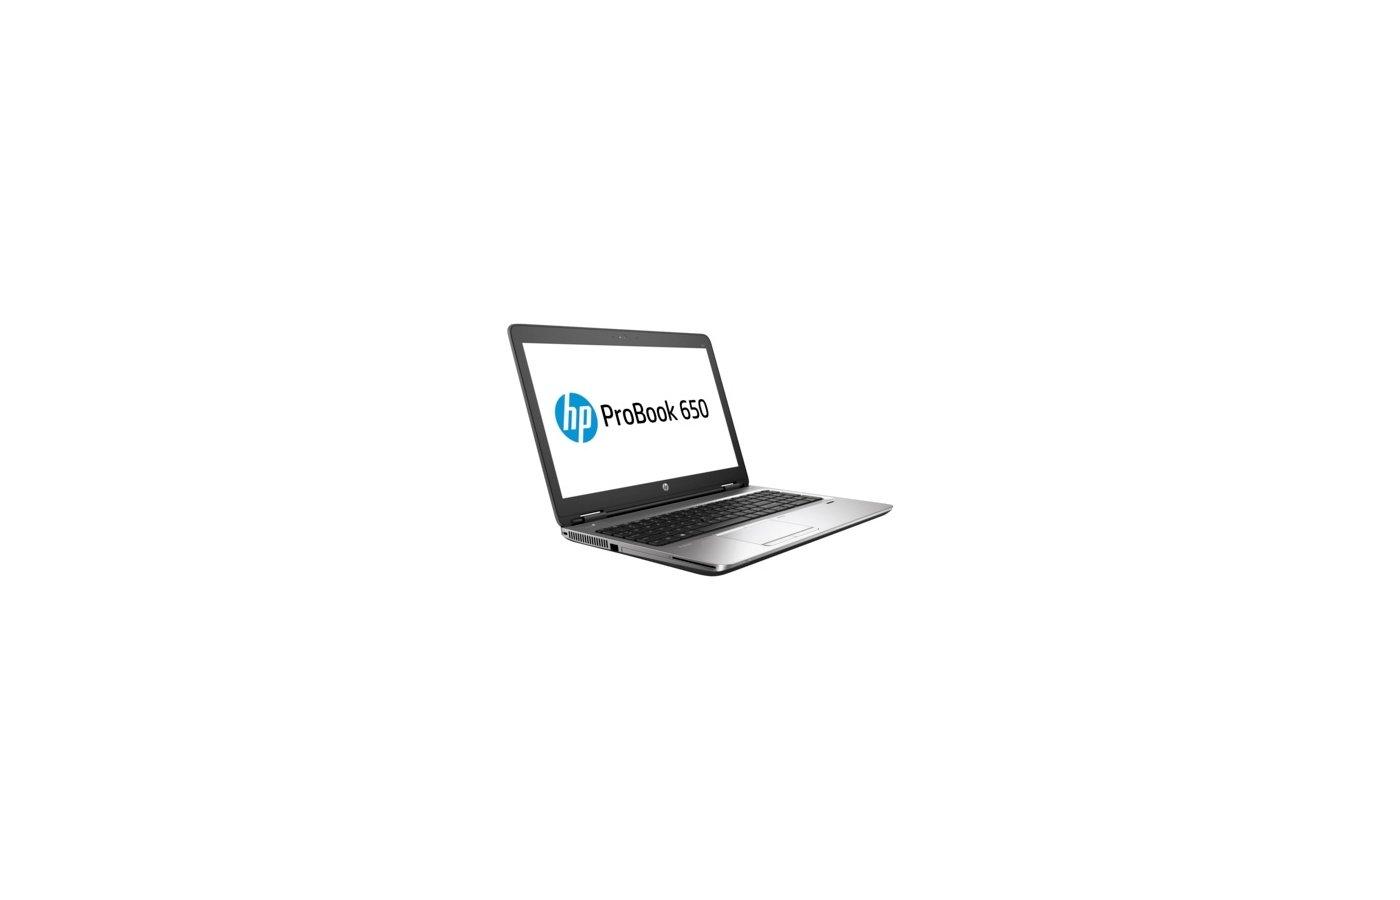 Ноутбук HP Probook 650 UMA /Y3B10EA/